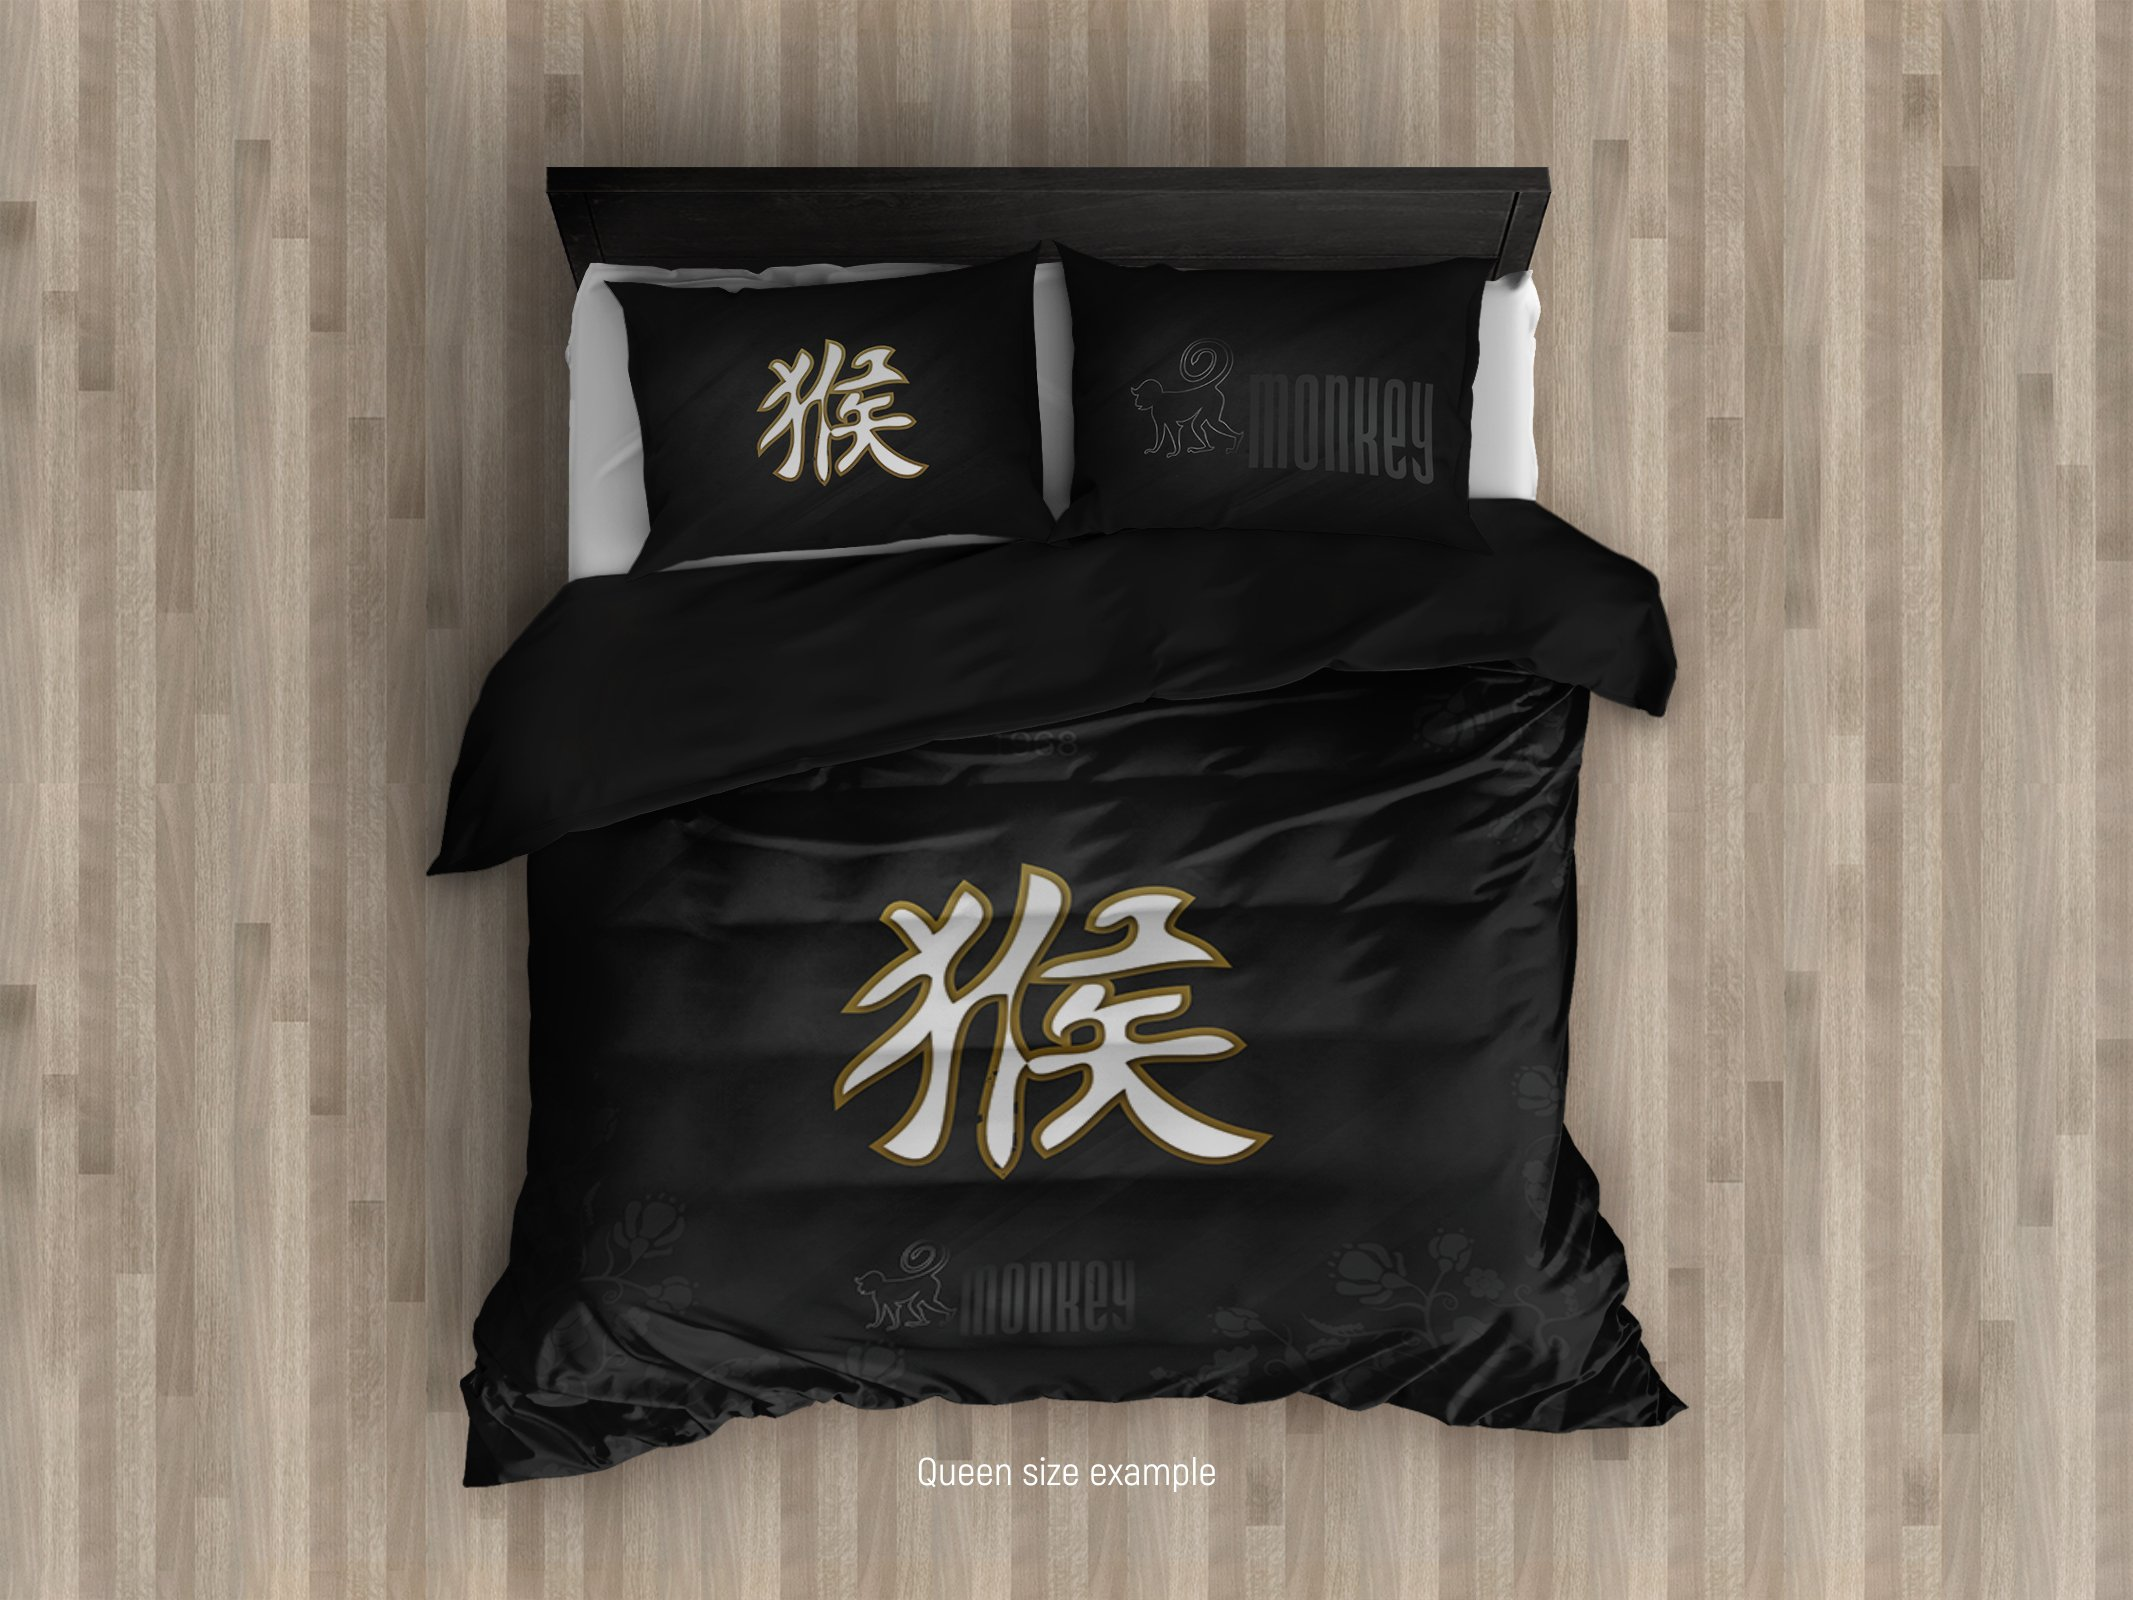 Cool Bedding`s Chinese Zodiac Duvet Cover Set of 3 or 4 Pcs Chinese Hieroglyphs Bedding Set, Modern Bedding, Zodiac Quilt, College Bedding King Queen Twin Single Set (King 104''x92'' $198)